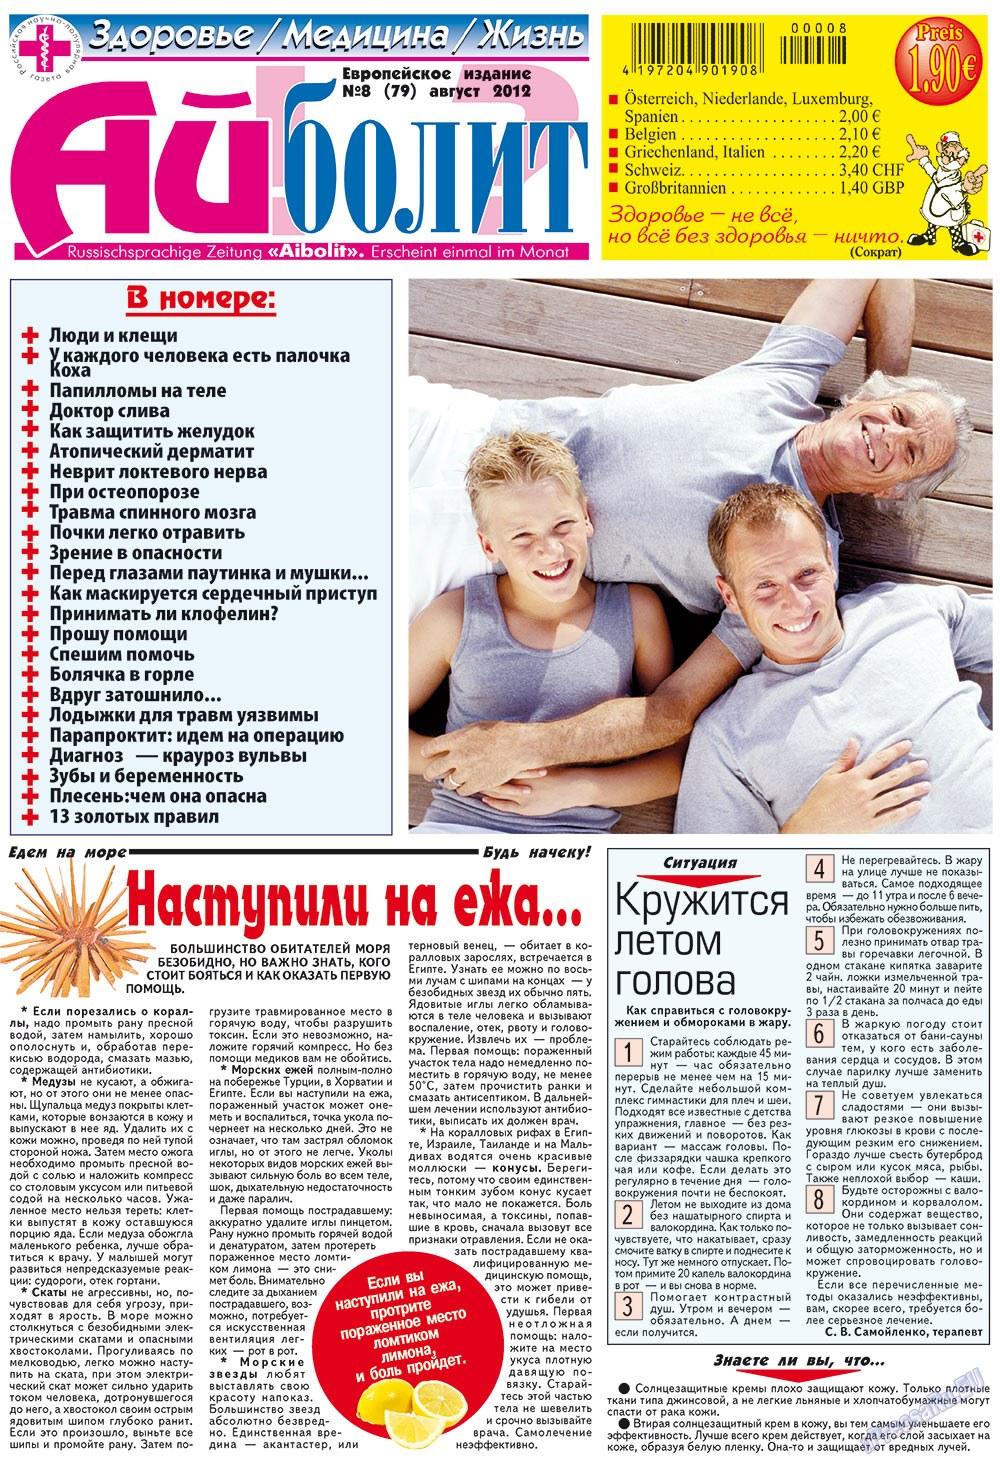 АйБолит (газета). 2012 год, номер 8, стр. 1